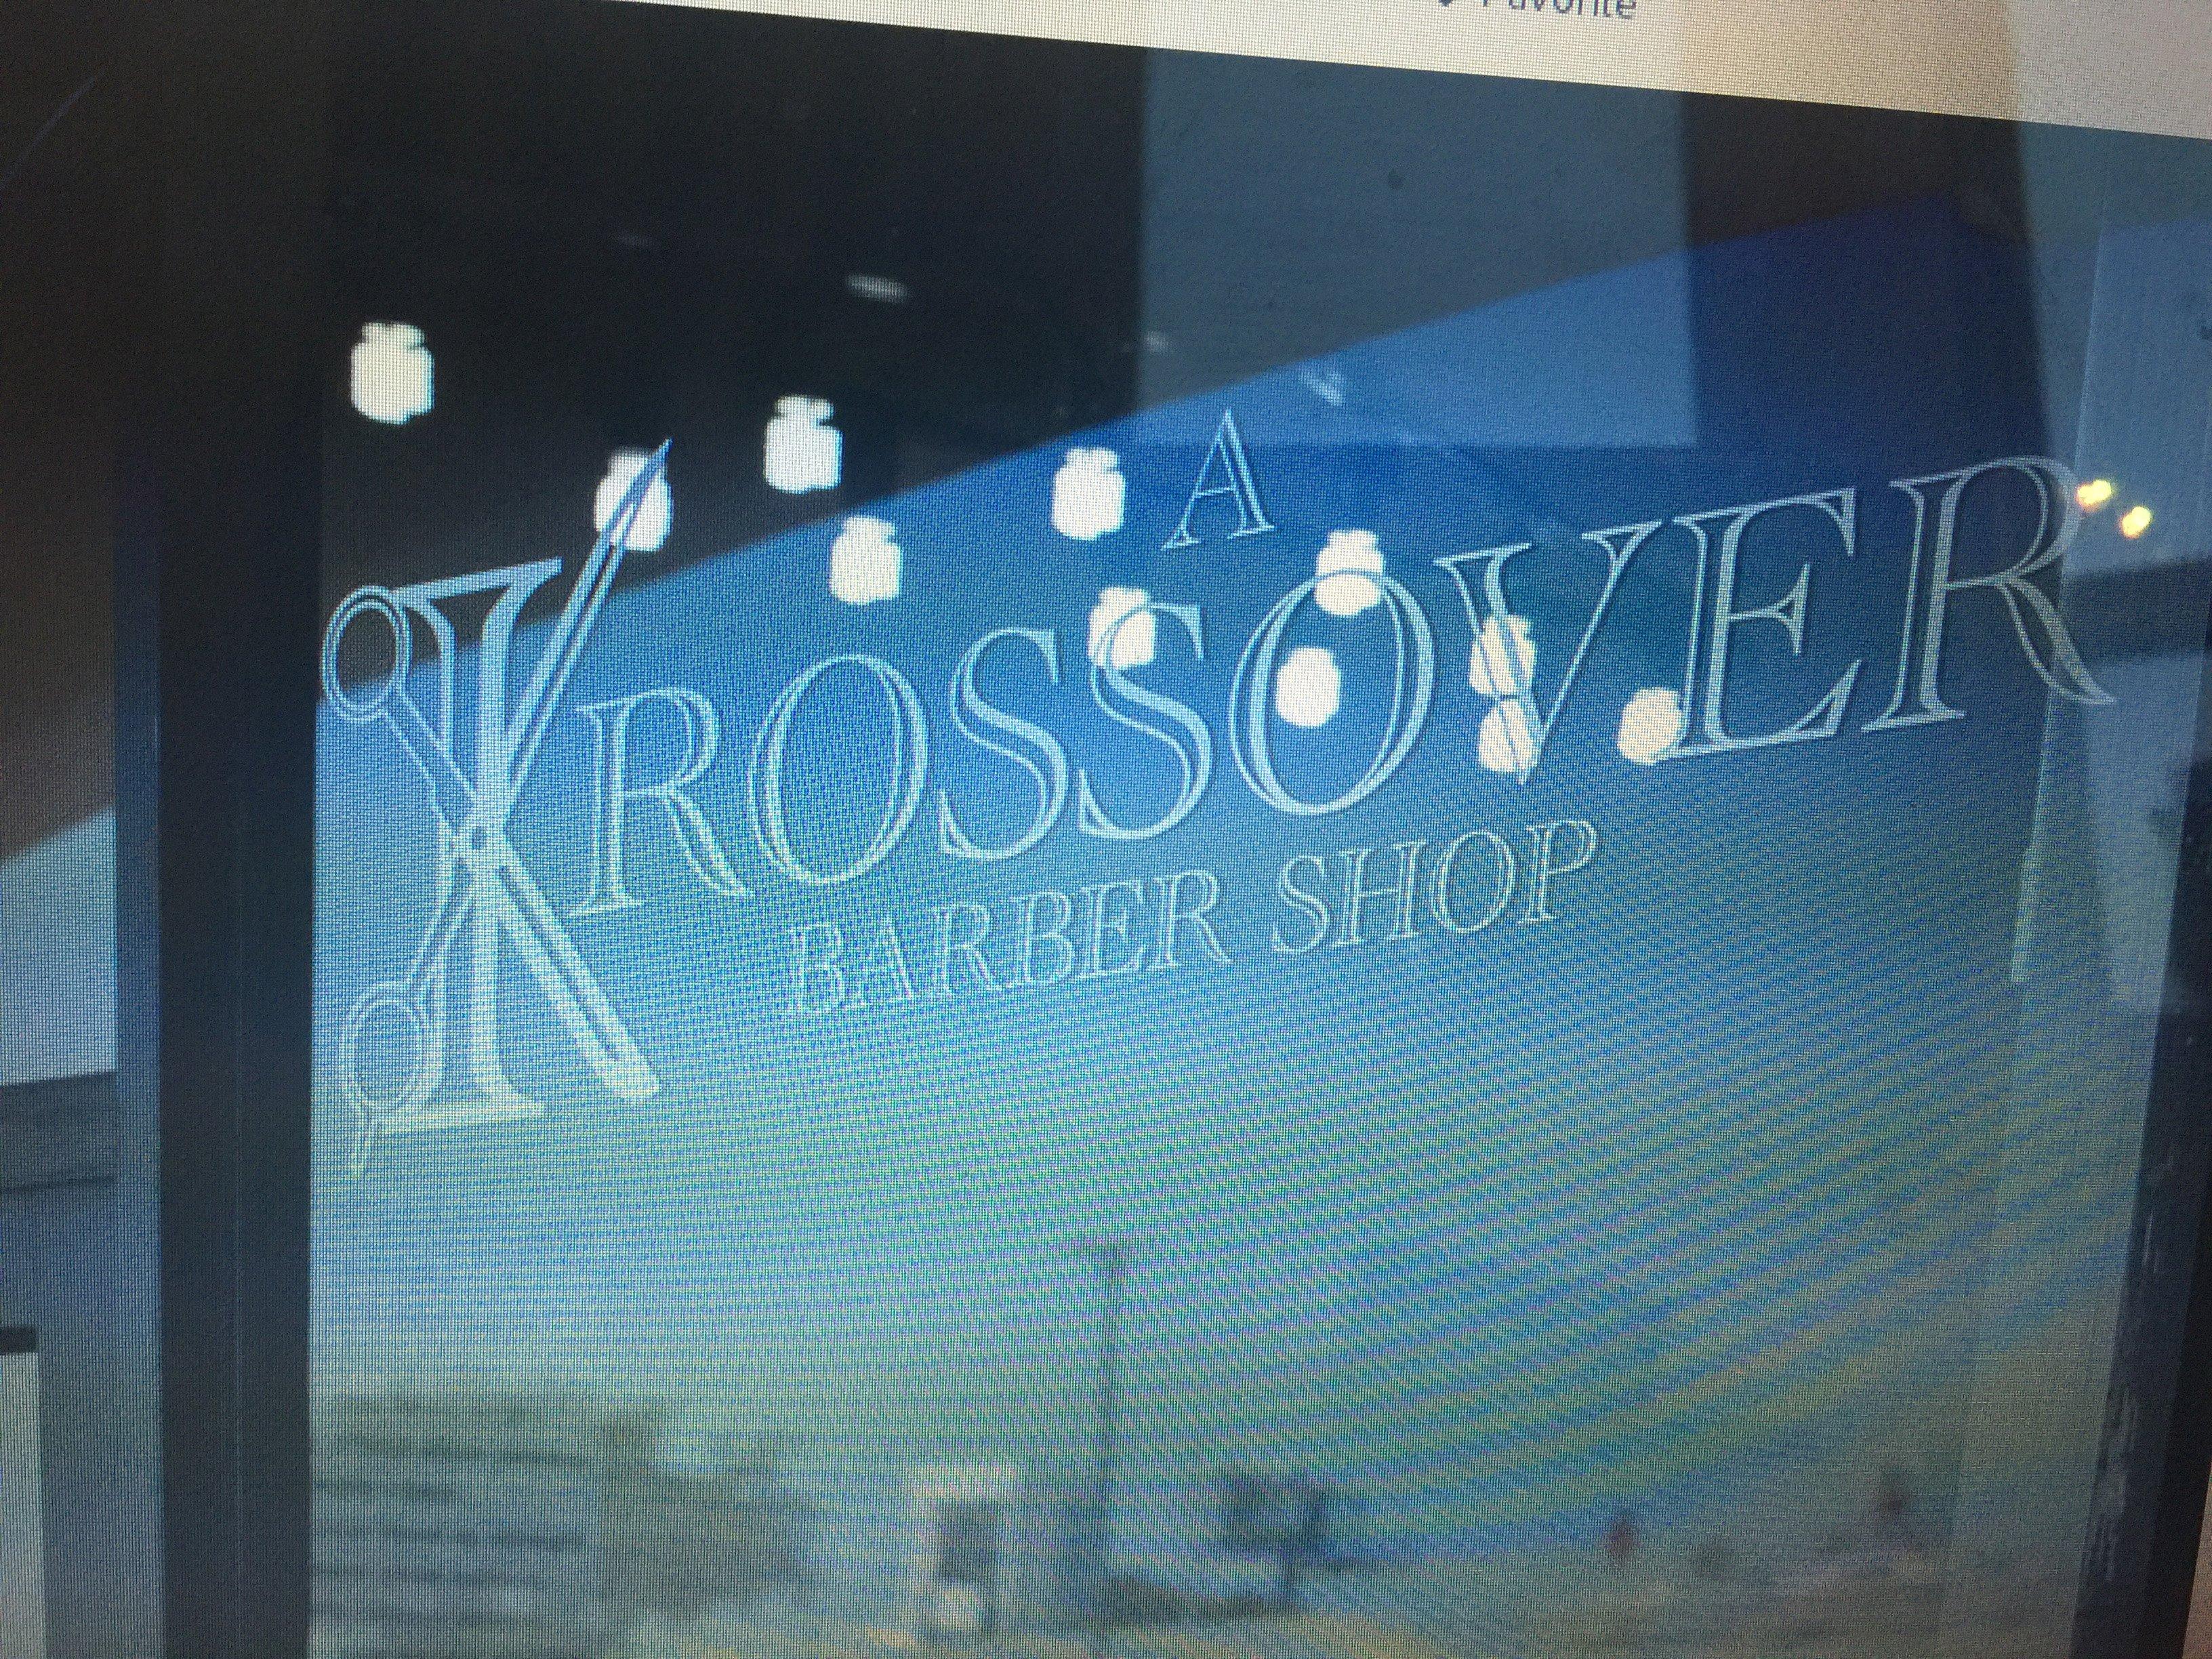 Krosssover Barbershop